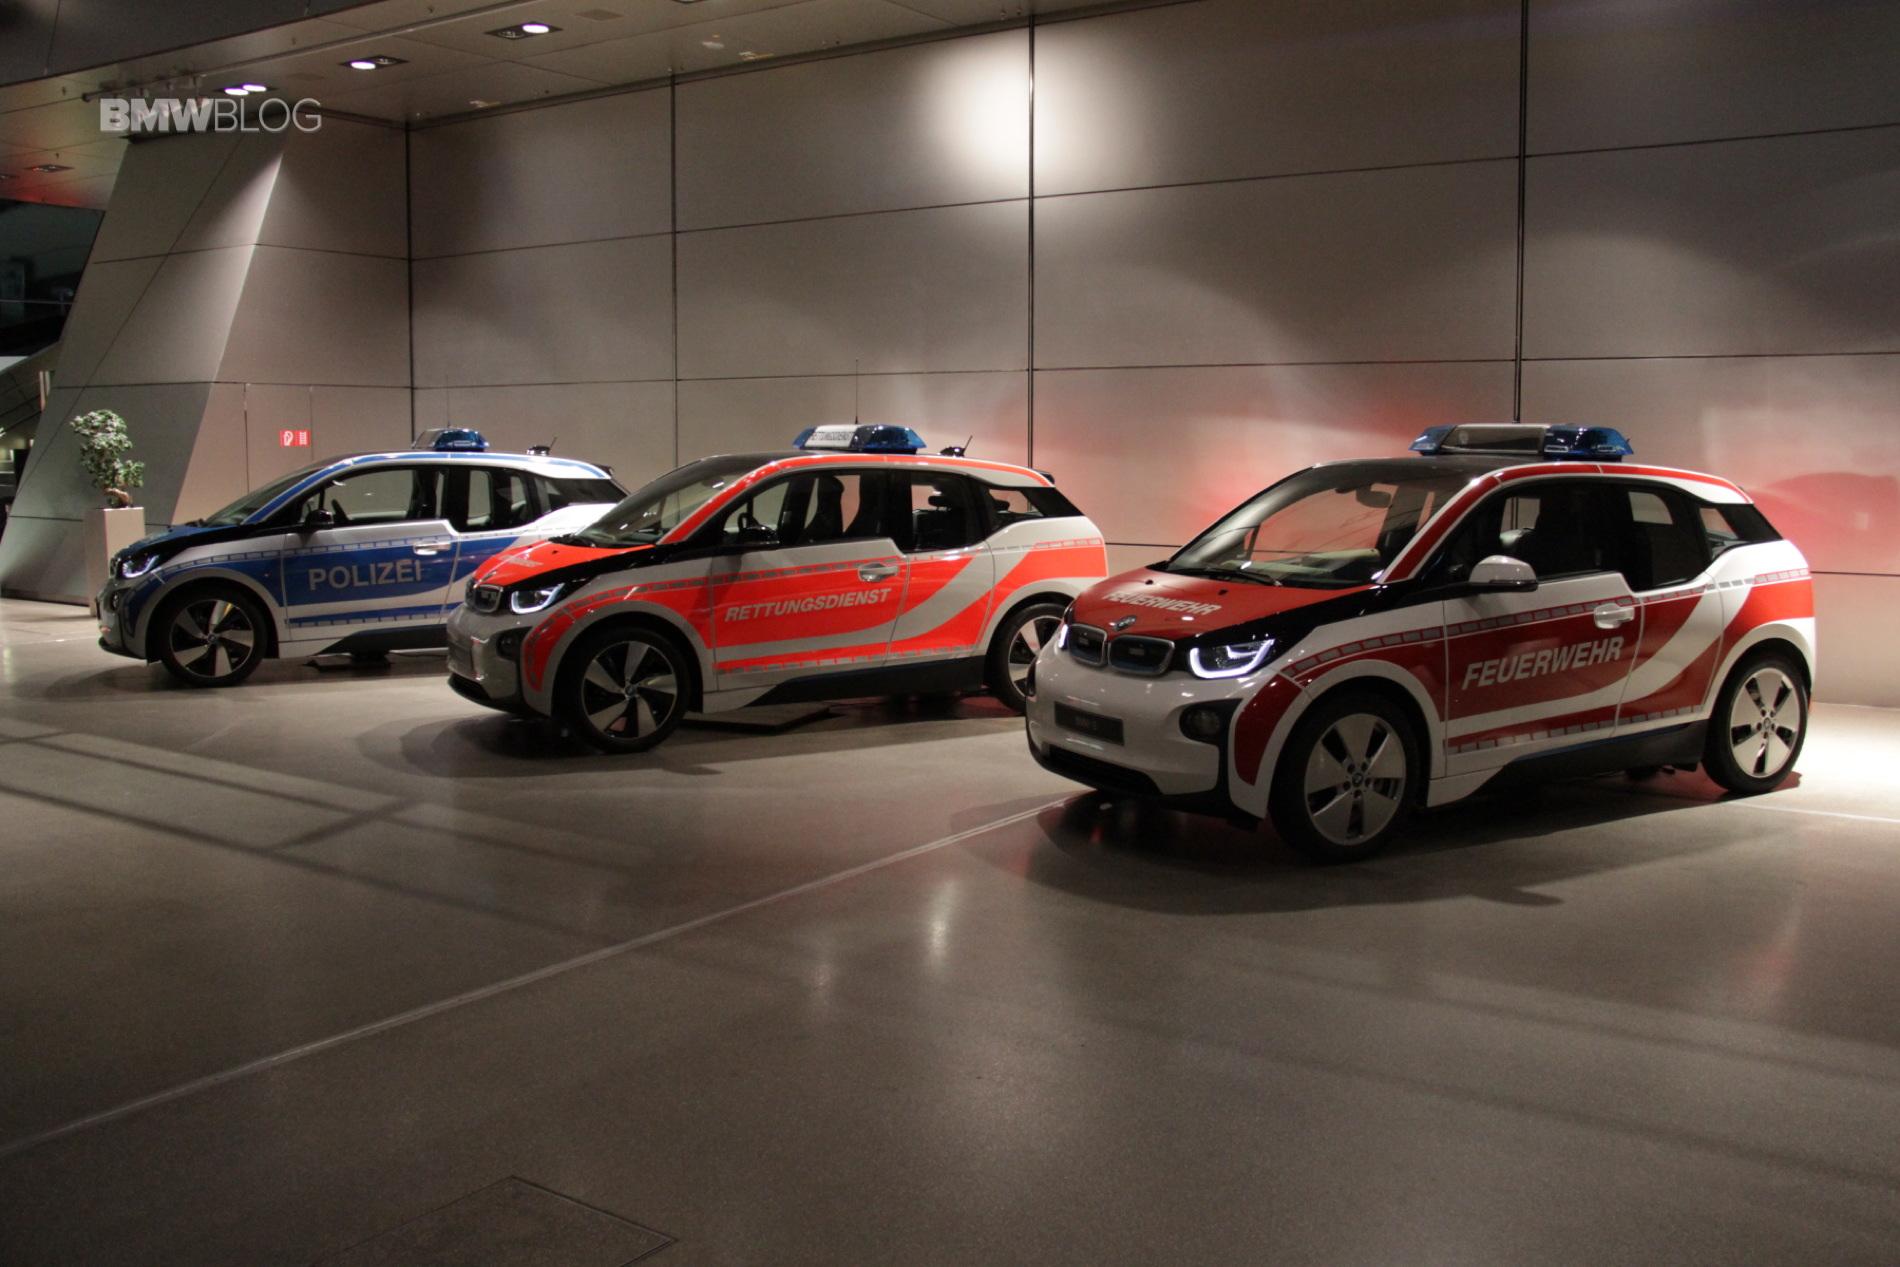 BMW i3 emergency cars BMW Welt 2